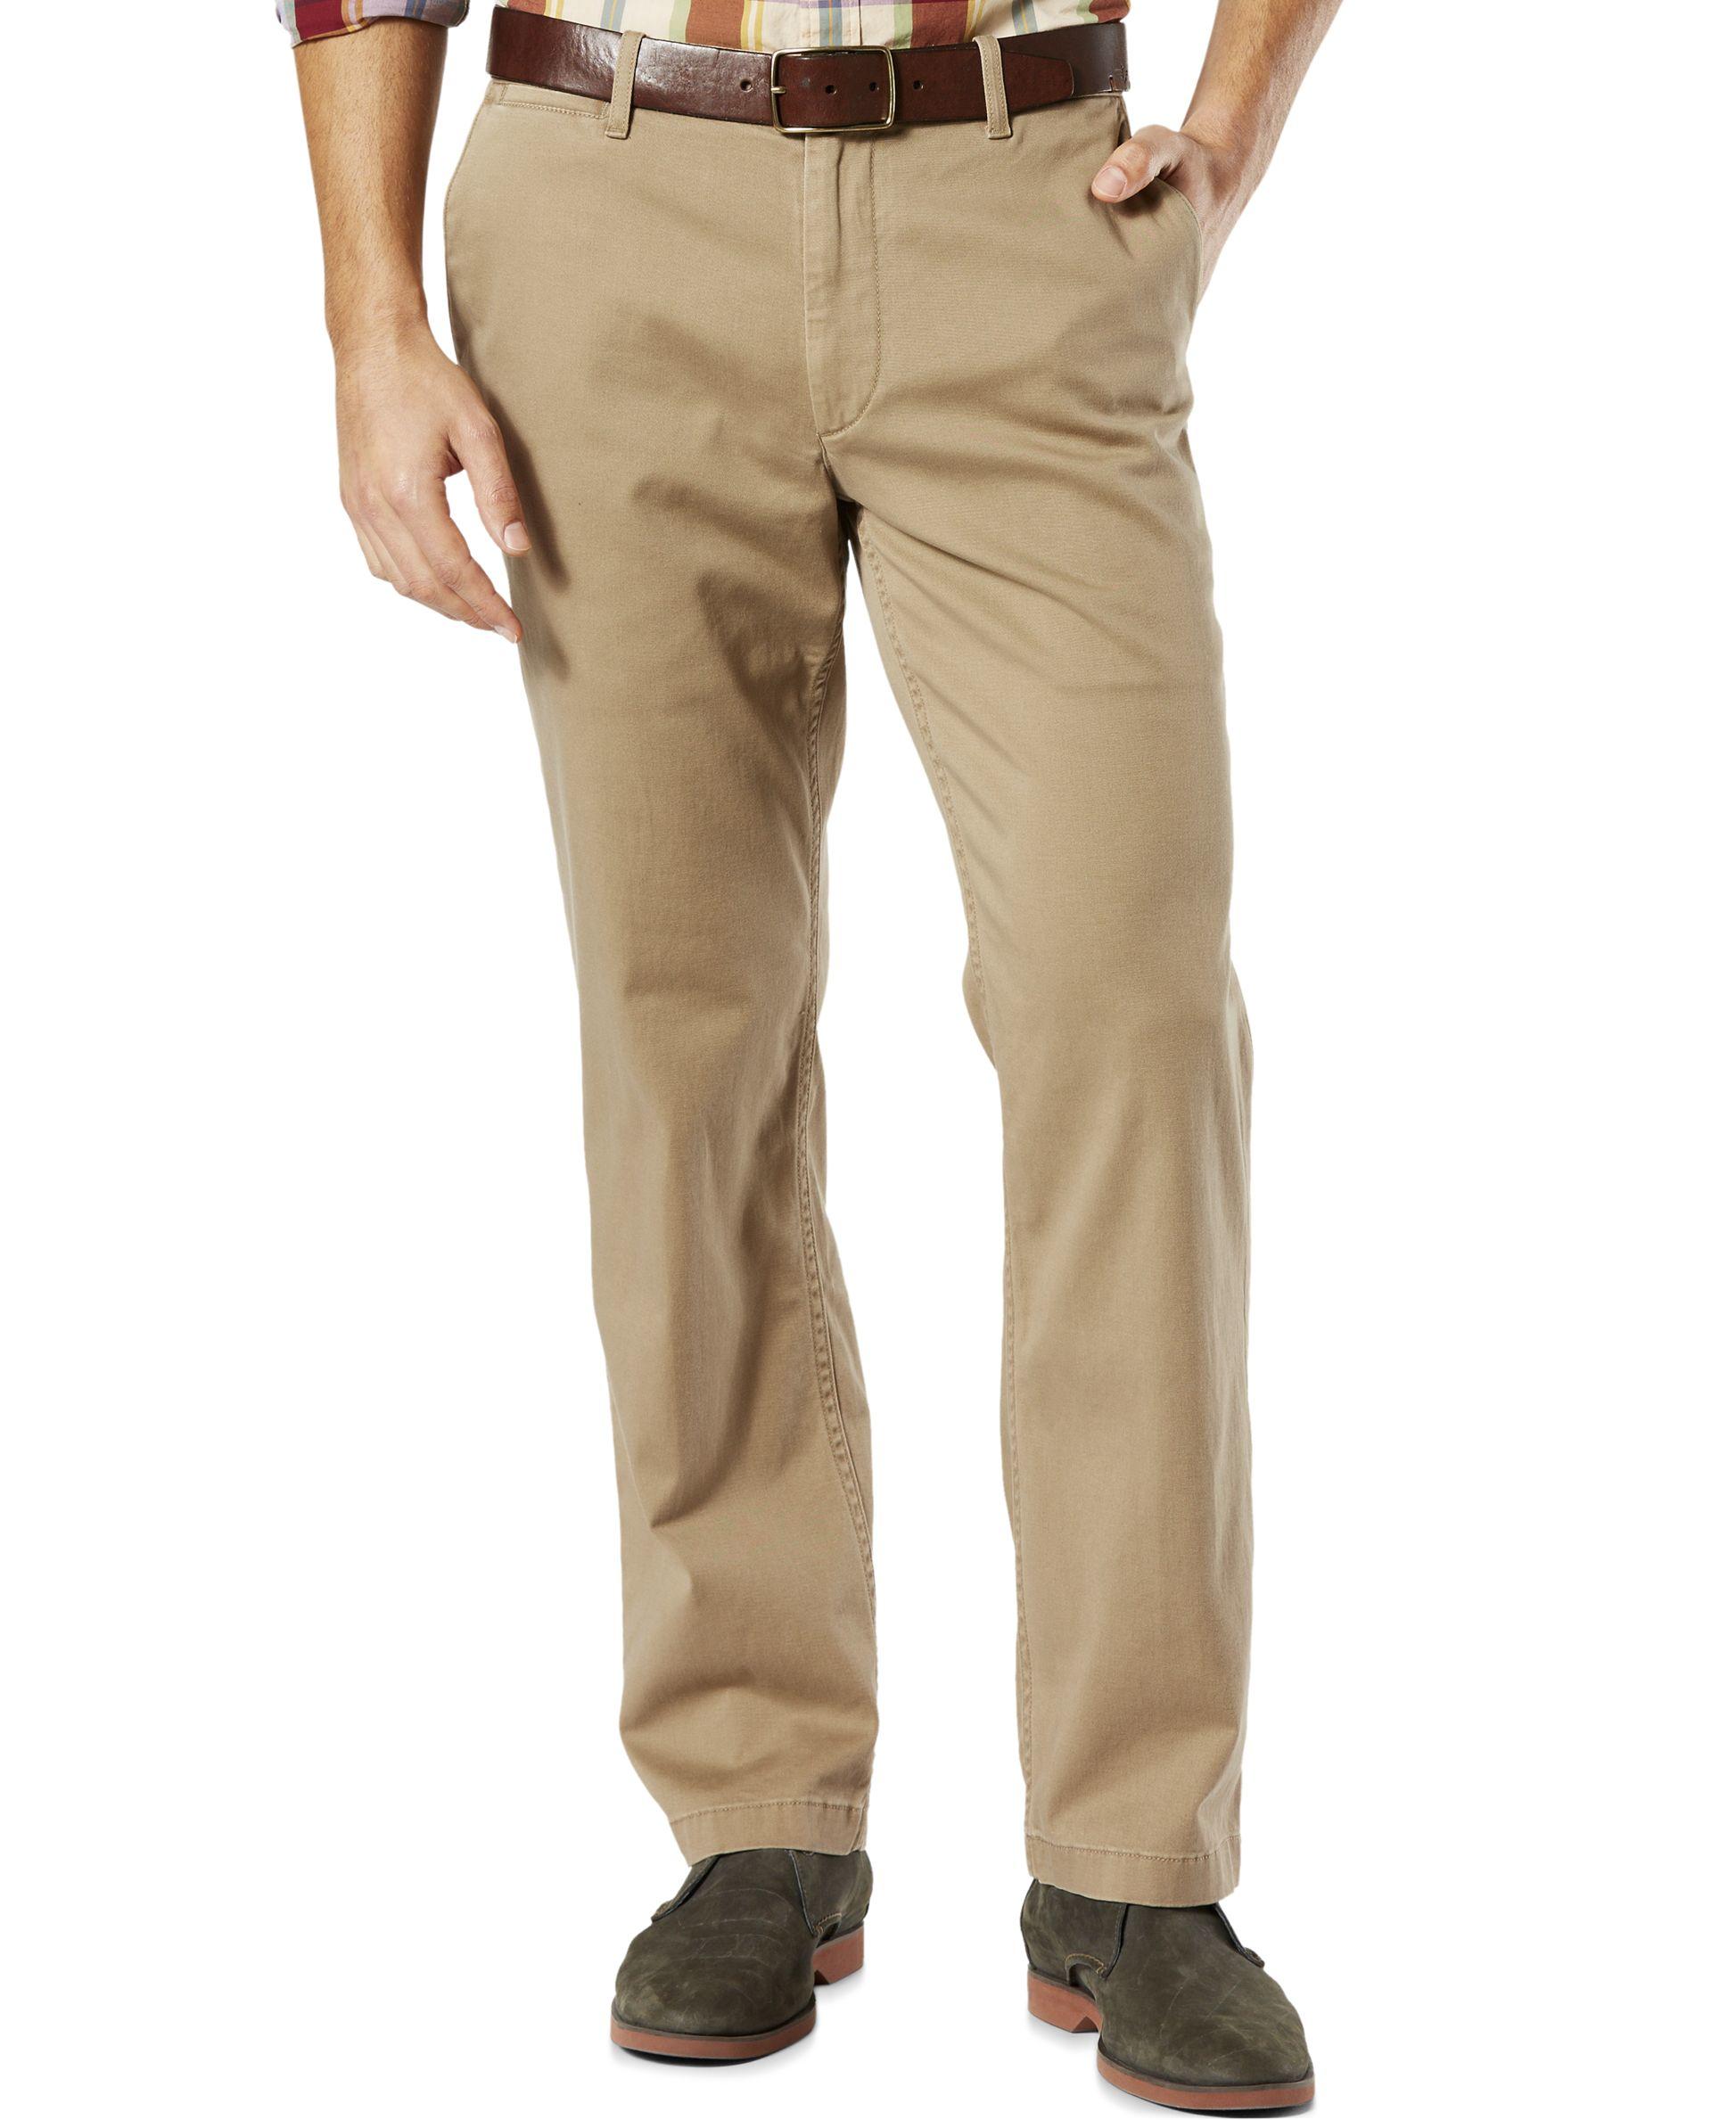 Wonderful Dockers Classic Fit Khaki Pants In Brown For Men Dark Beige  Lyst